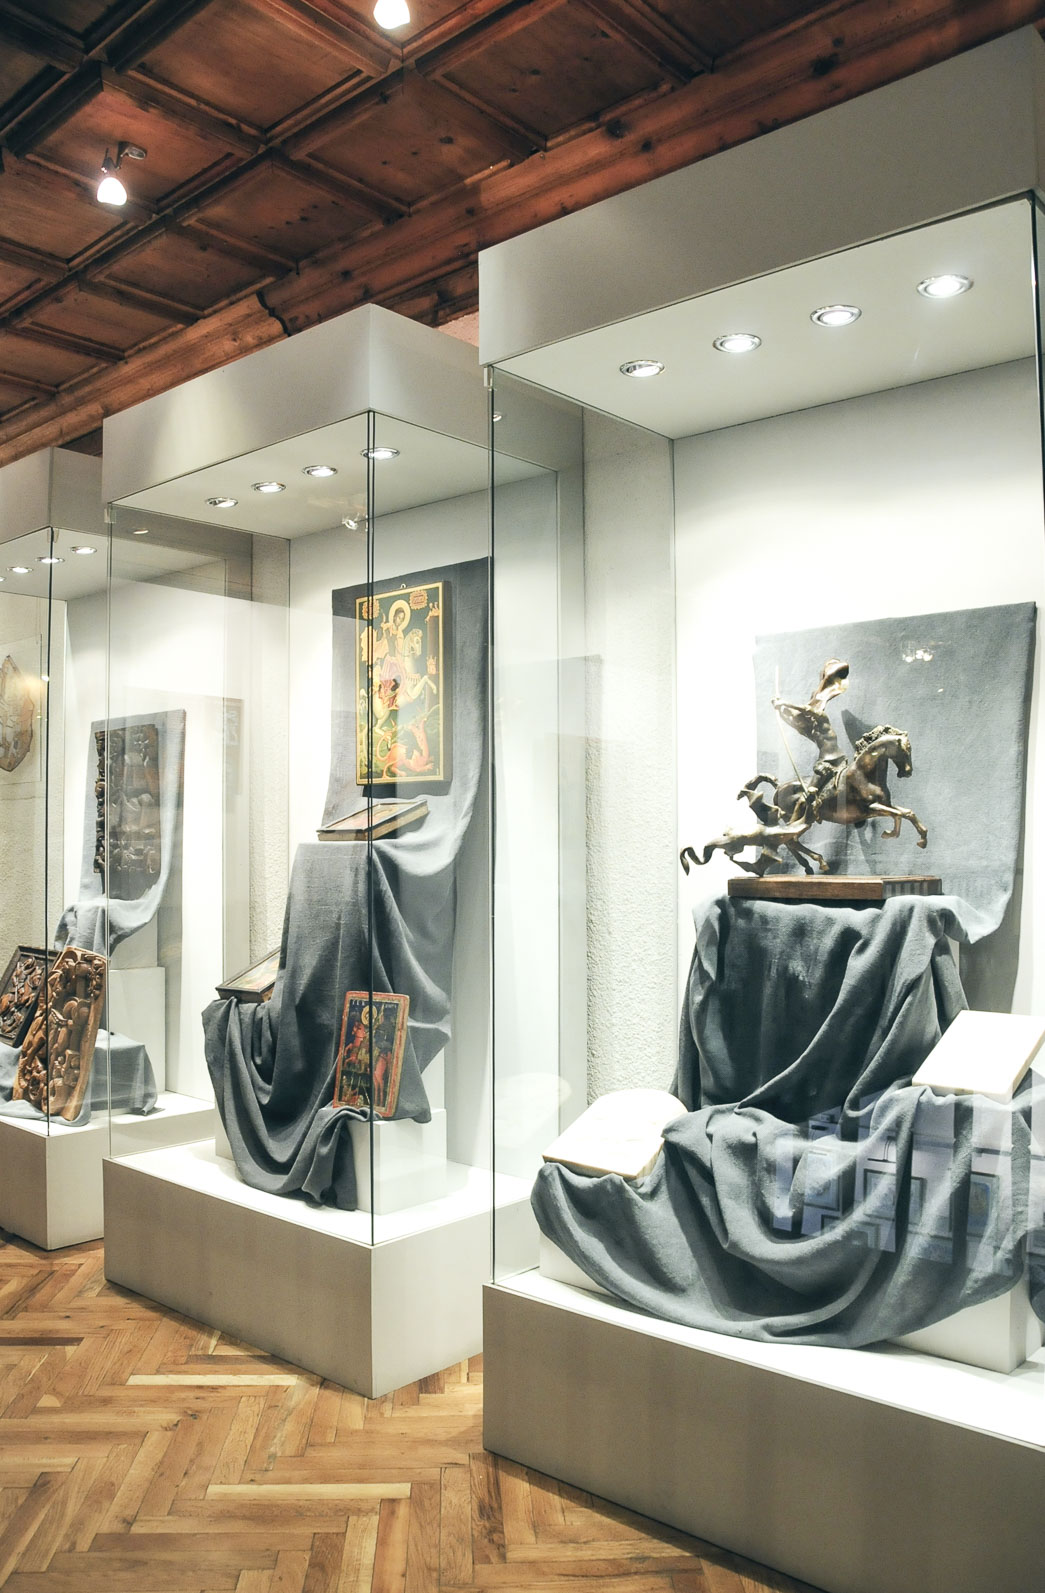 troyan-museum-jivotat-na-edna-idea-41